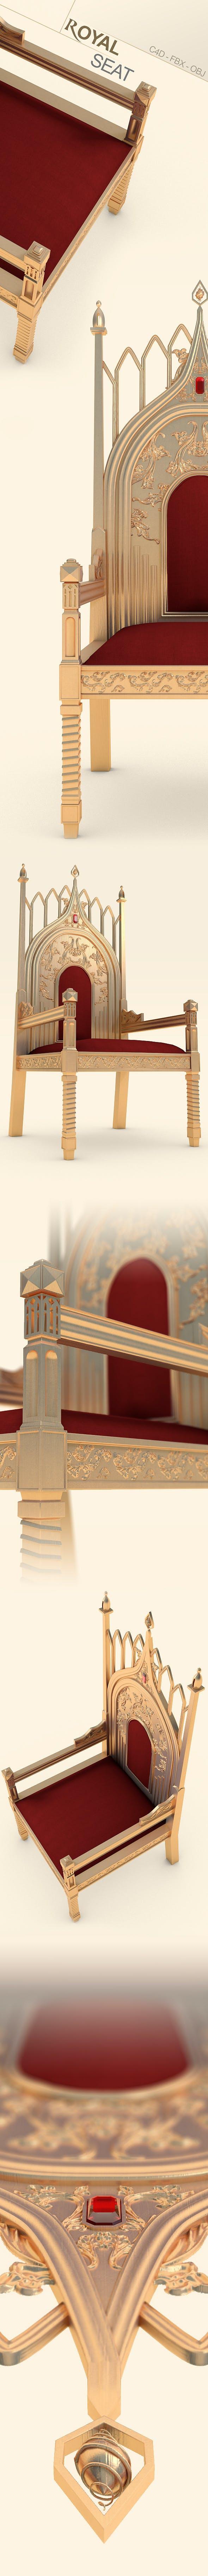 Royal Seat - 3DOcean Item for Sale